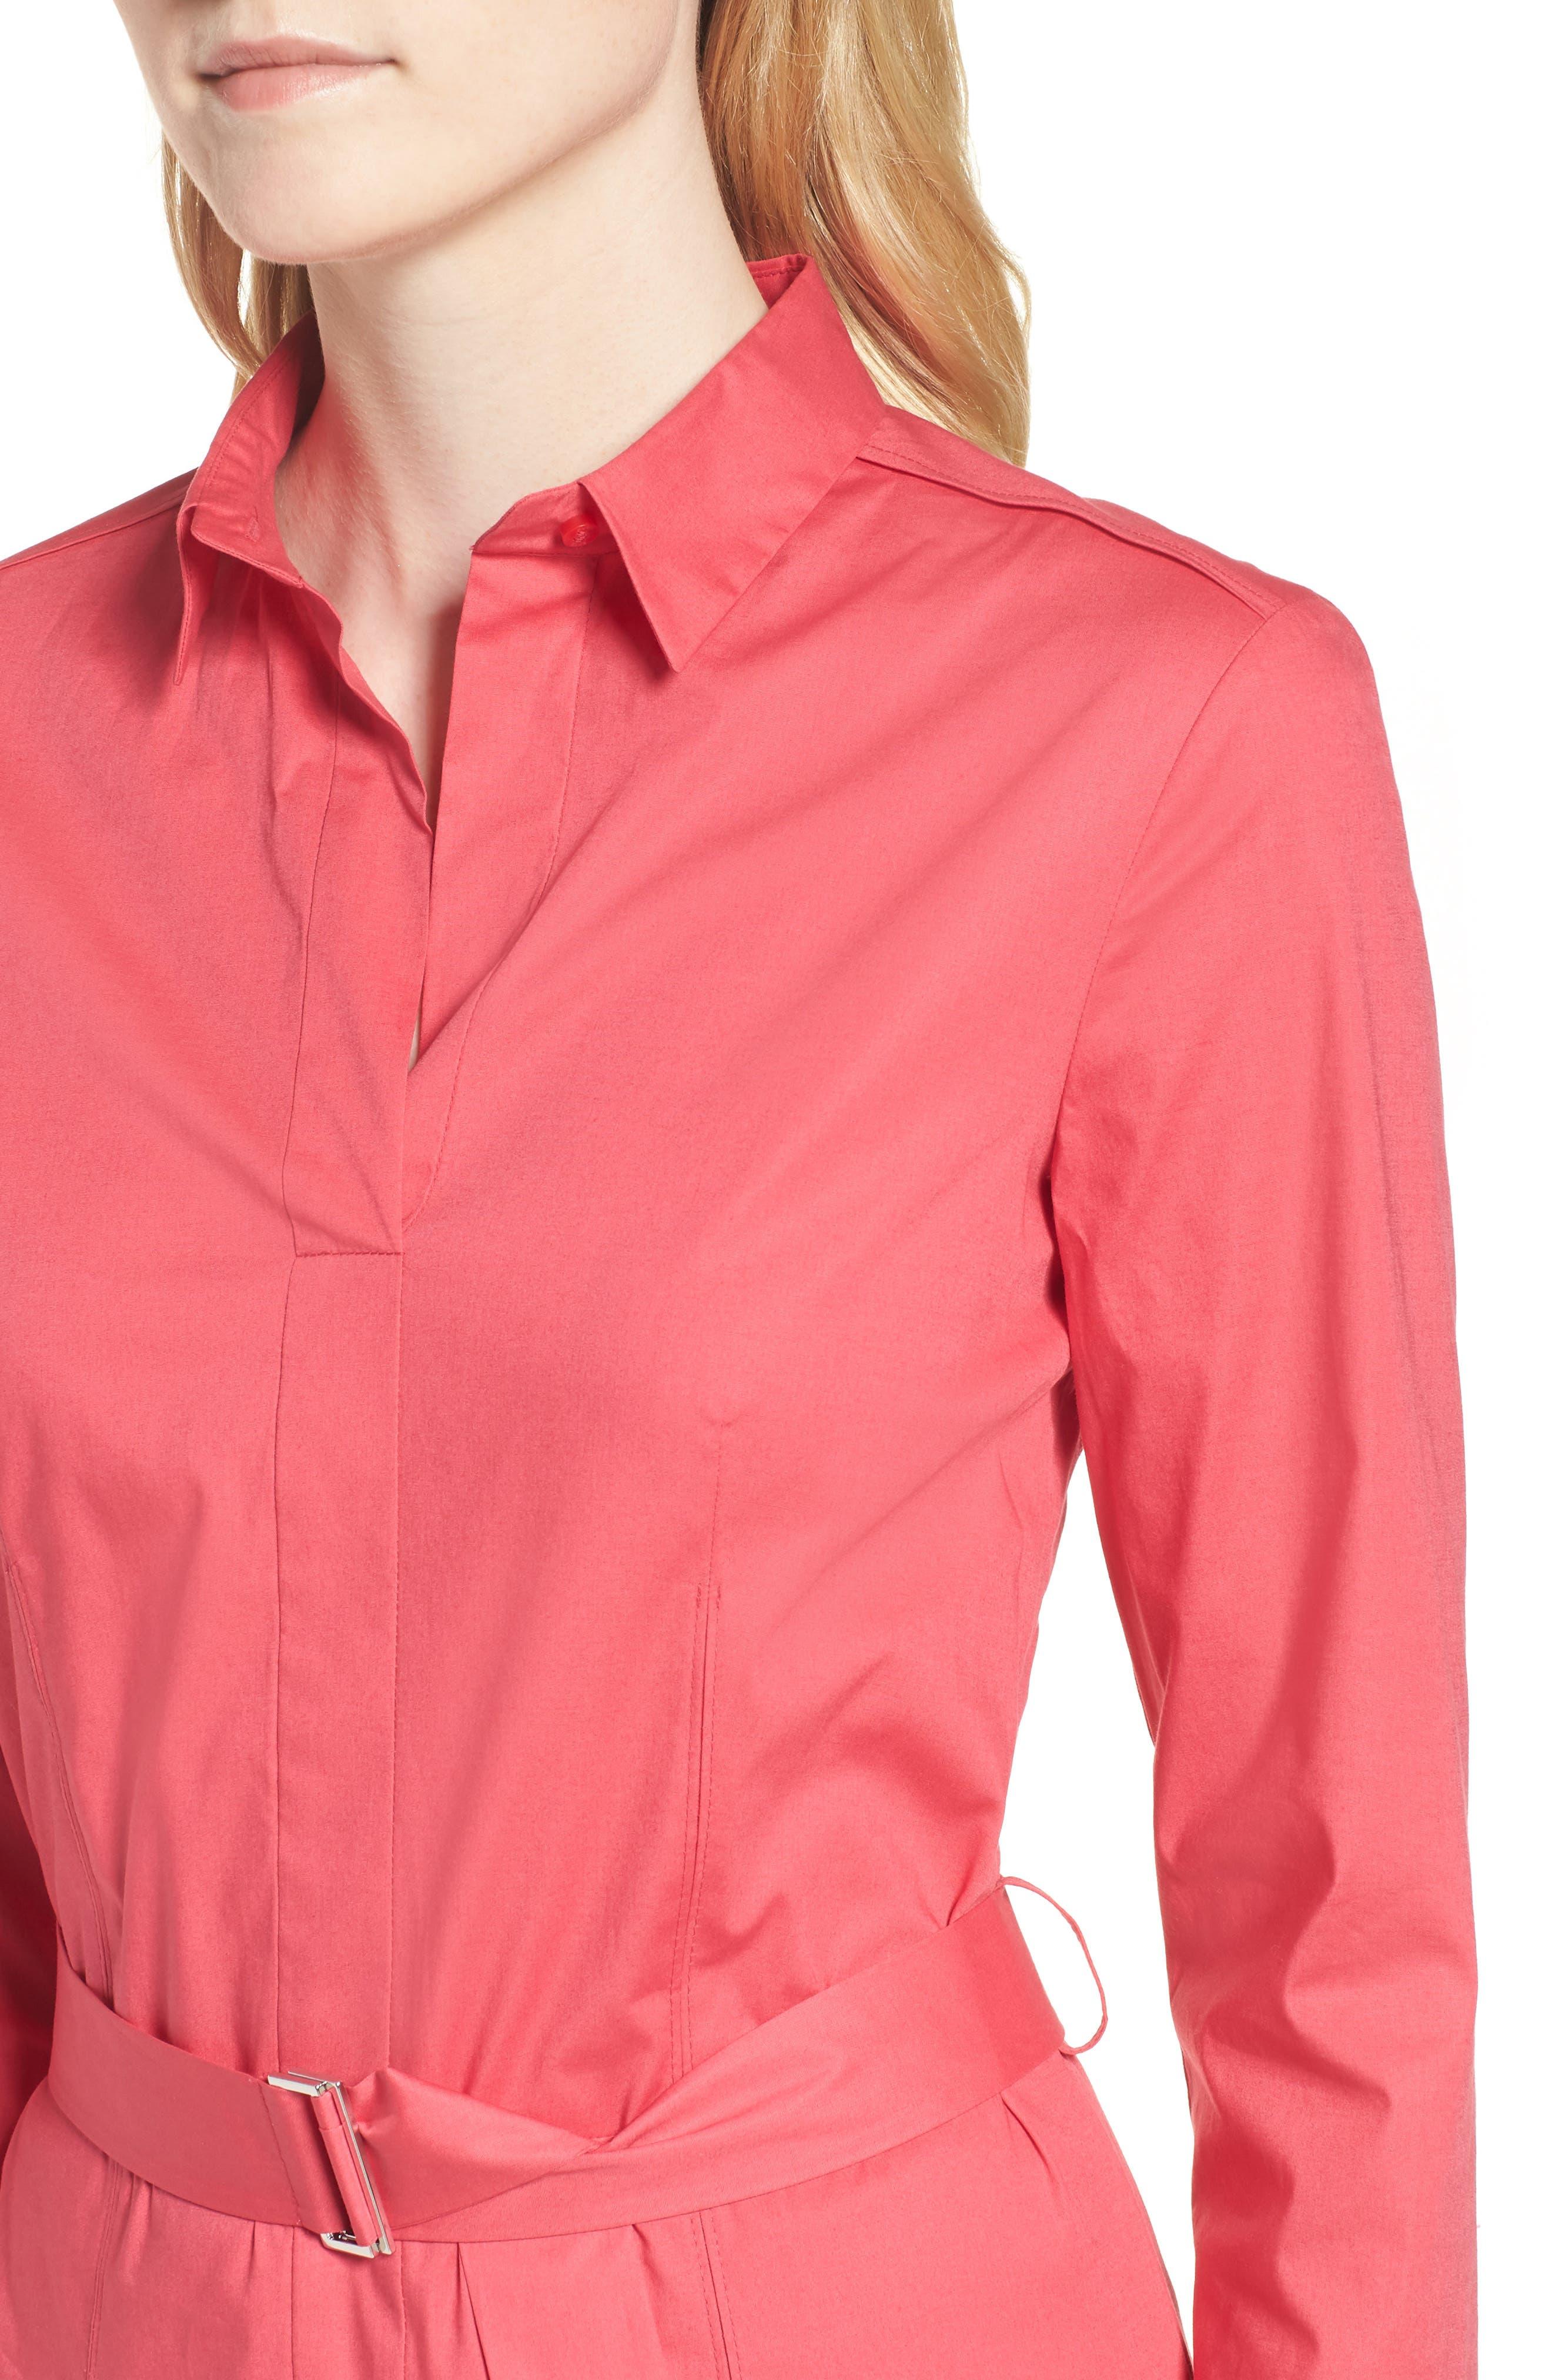 Dashiri Stretch Poplin Dress,                             Alternate thumbnail 4, color,                             Lychee Pink